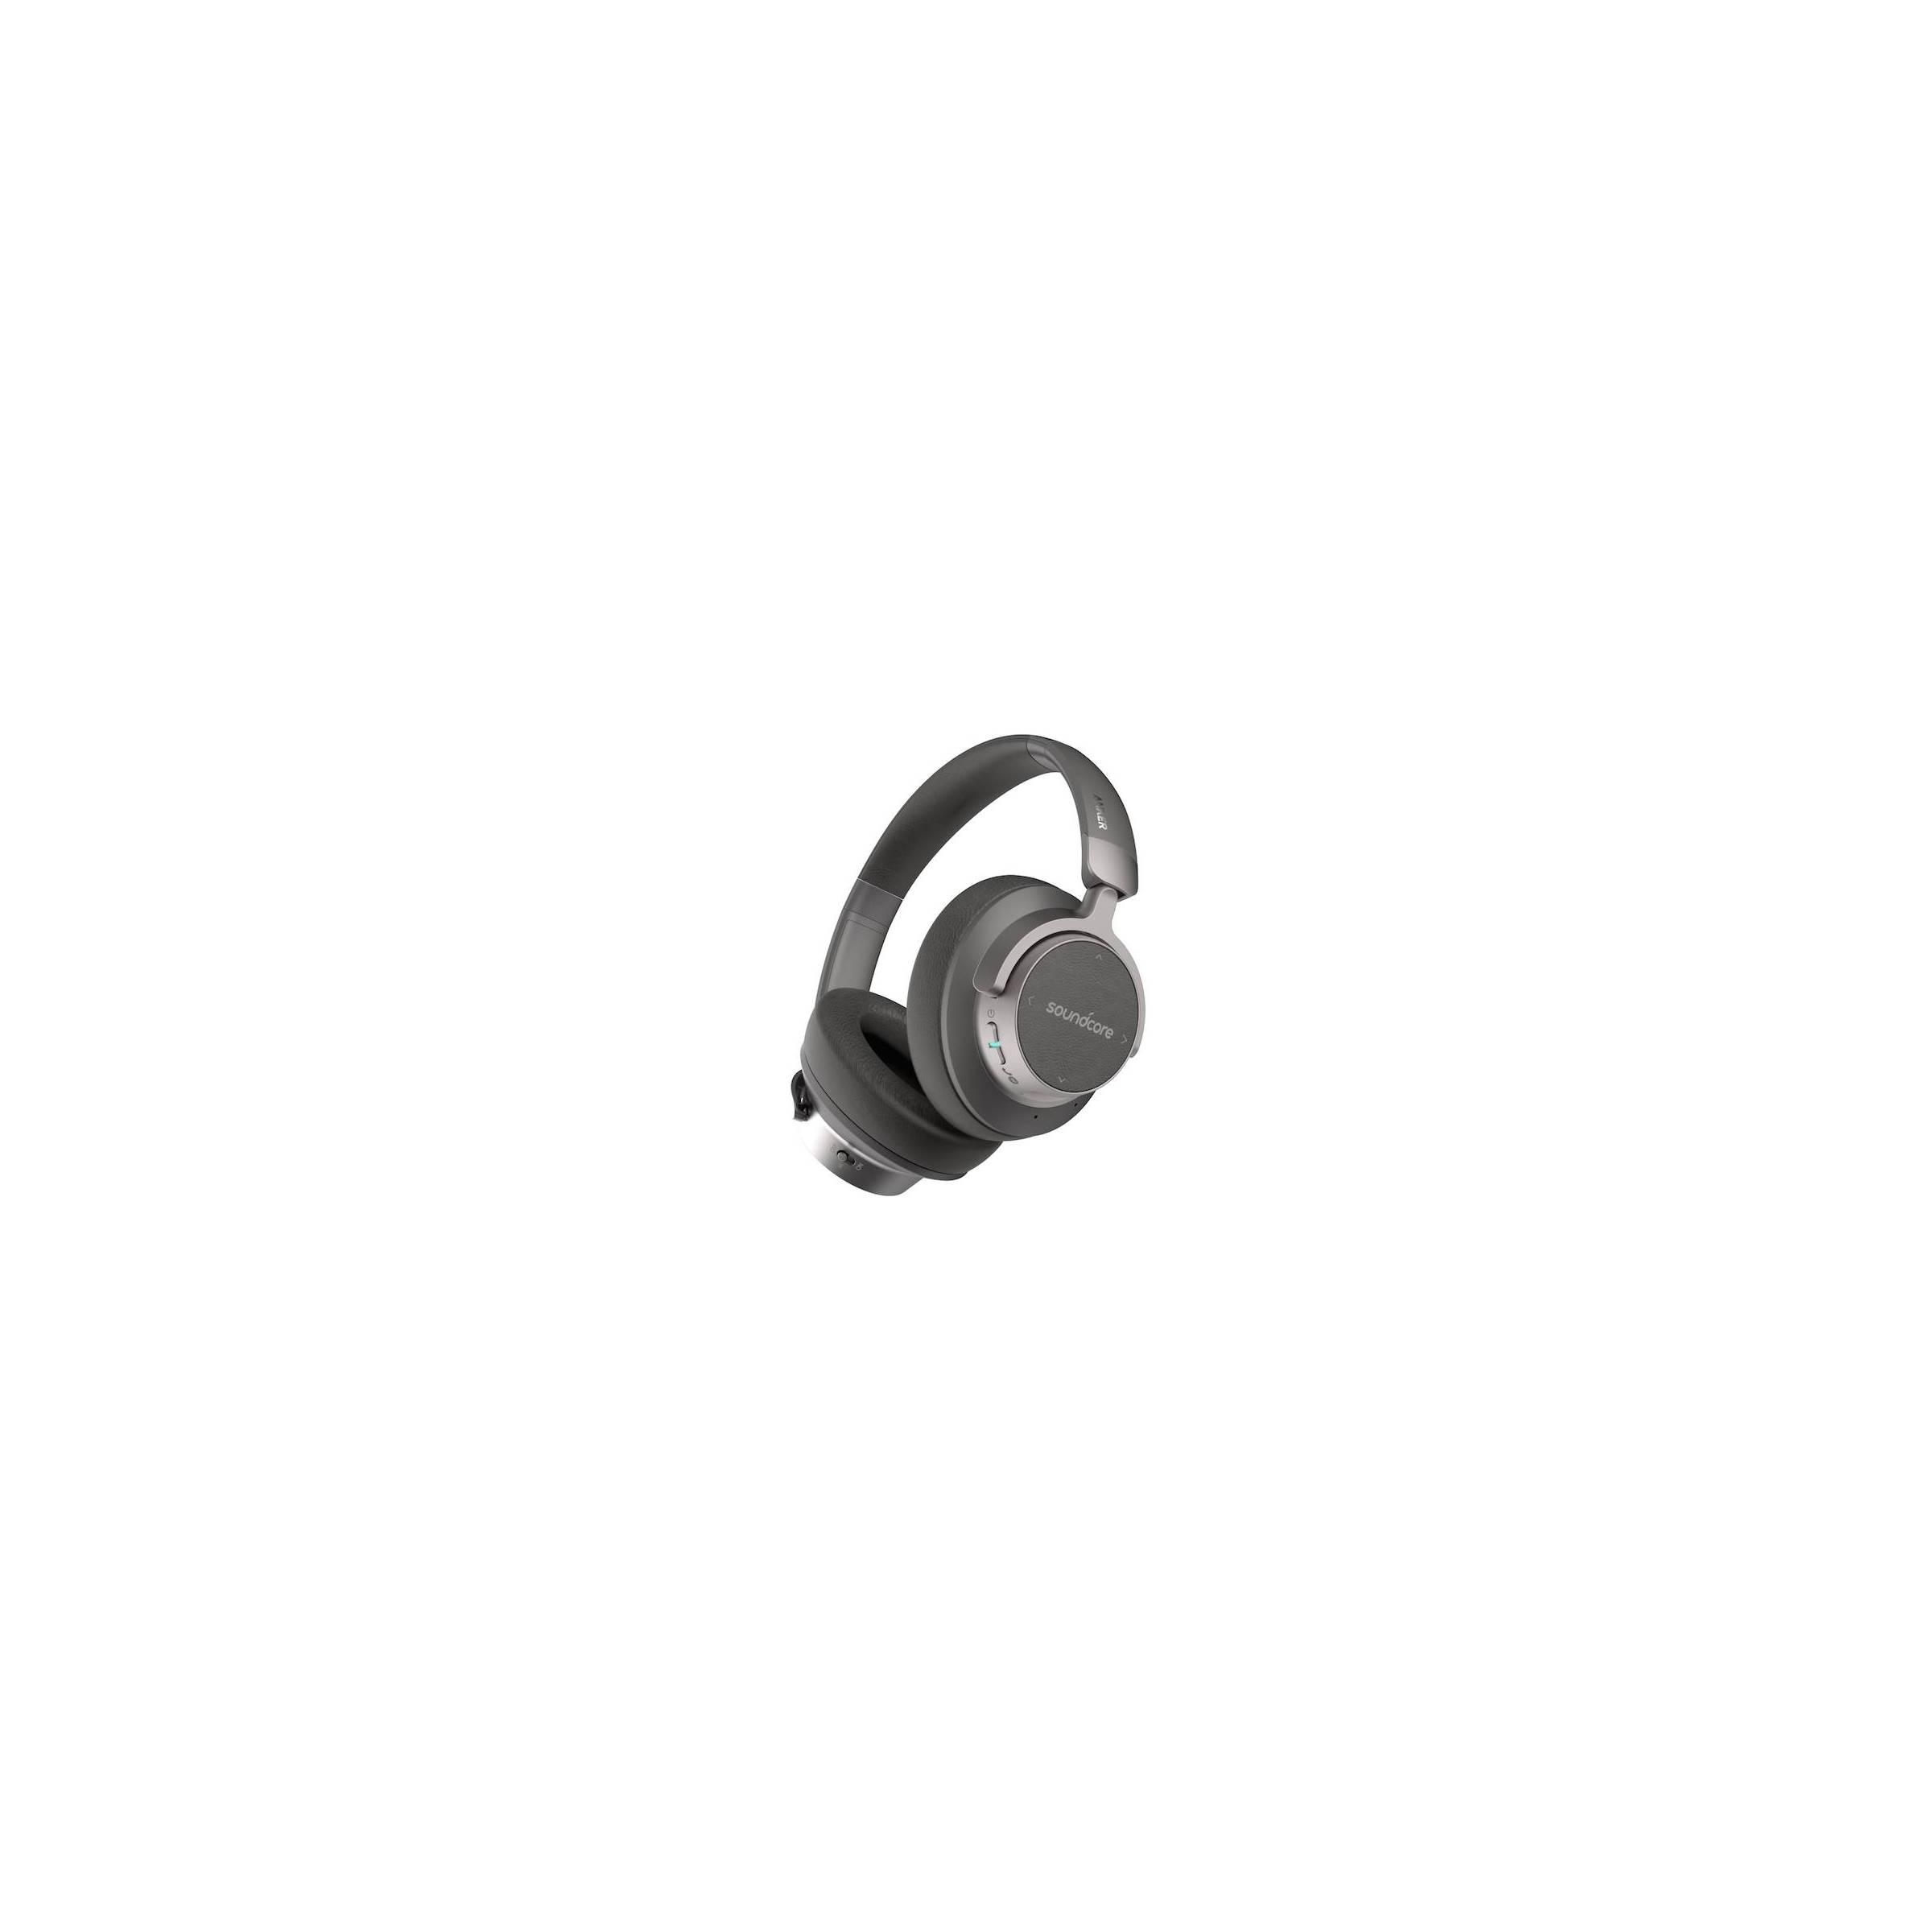 anker – Anker soundcore space nc headphones bluetooth noise-reduction fra mackabler.dk